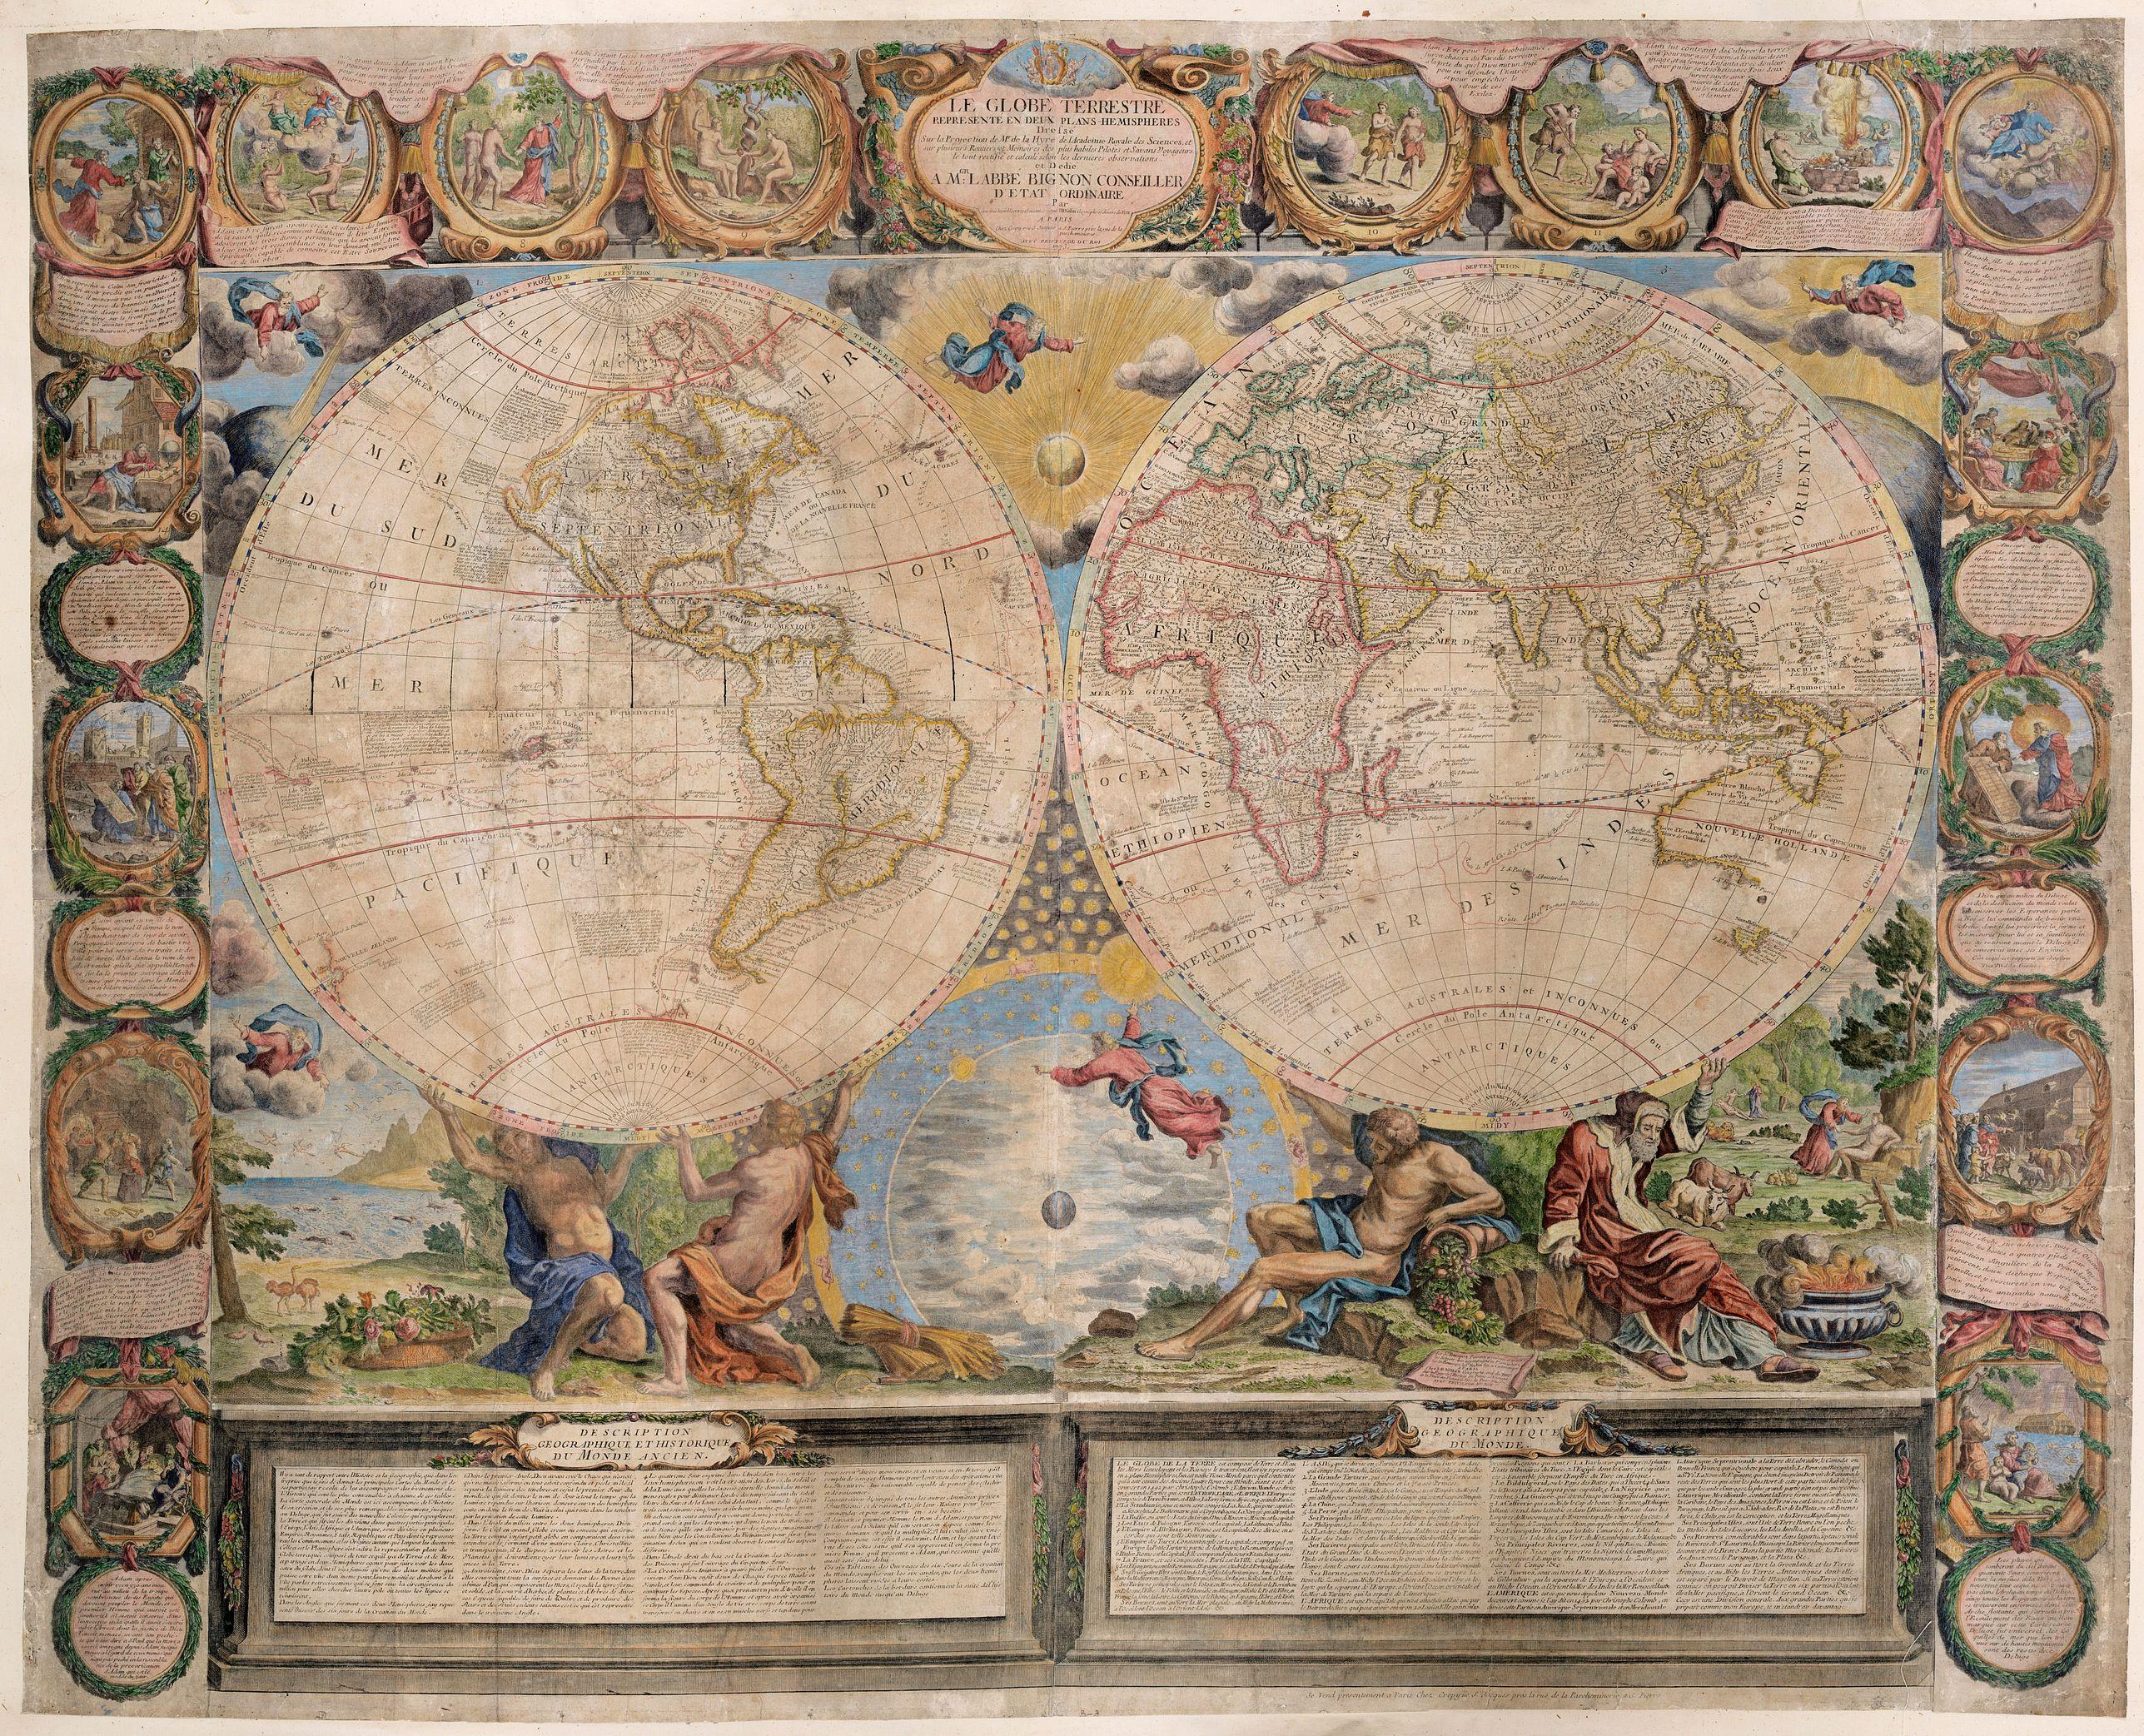 CREPY, J-B. / NOLIN, J.-B. -  Le Globe Terrestre represente en deux plans-hemispheres dresee. . .